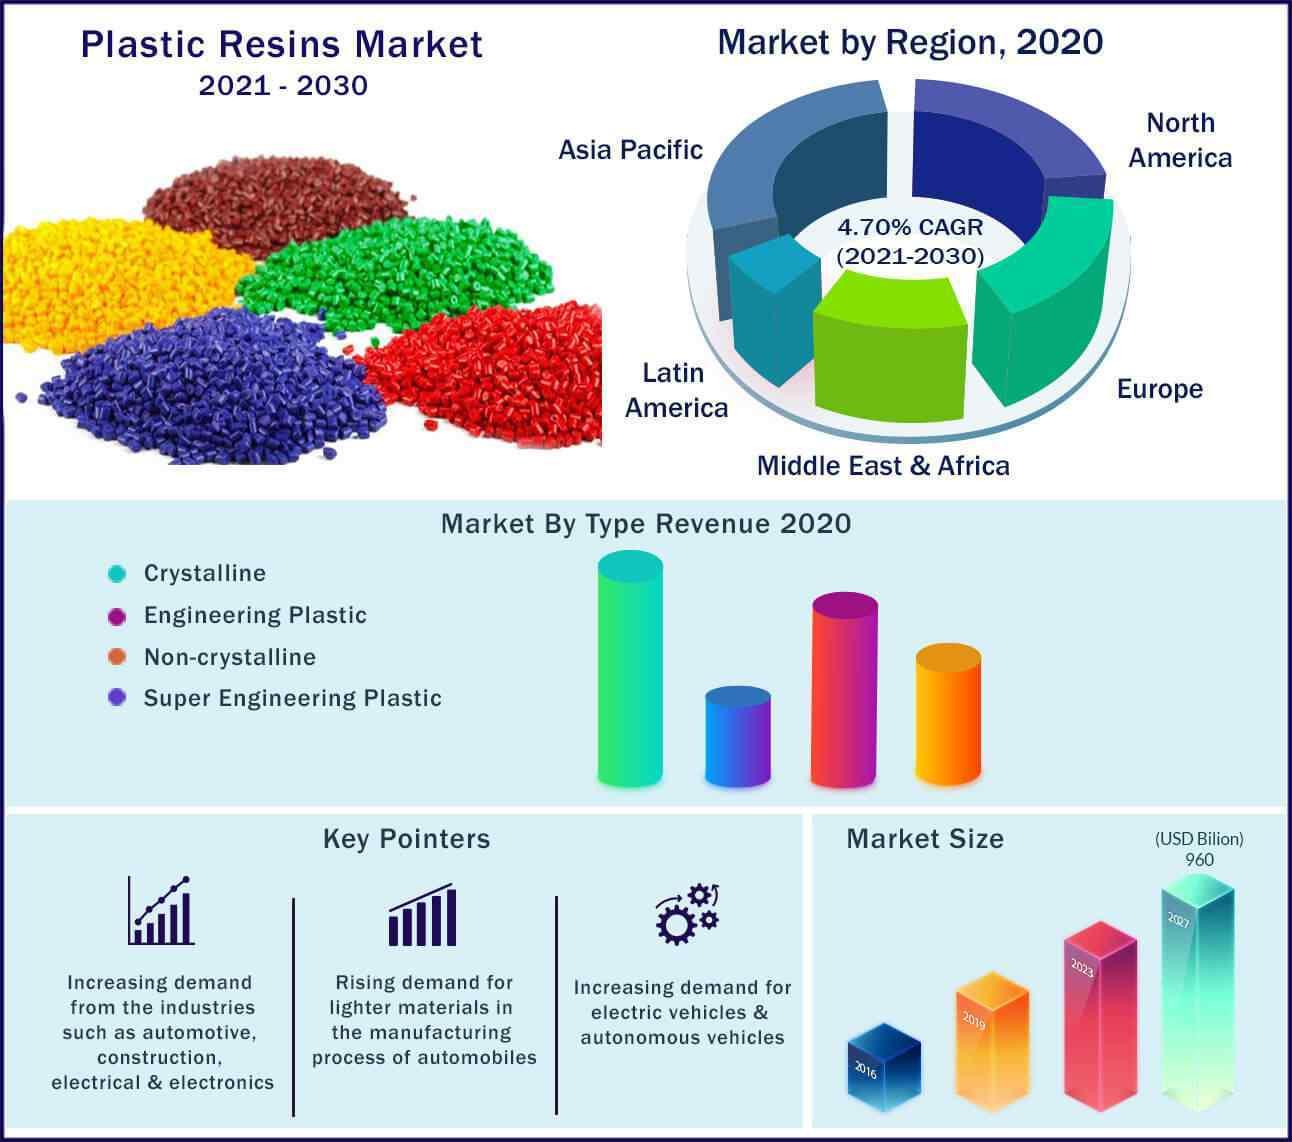 Global Plastic Resins Market 2021-2030